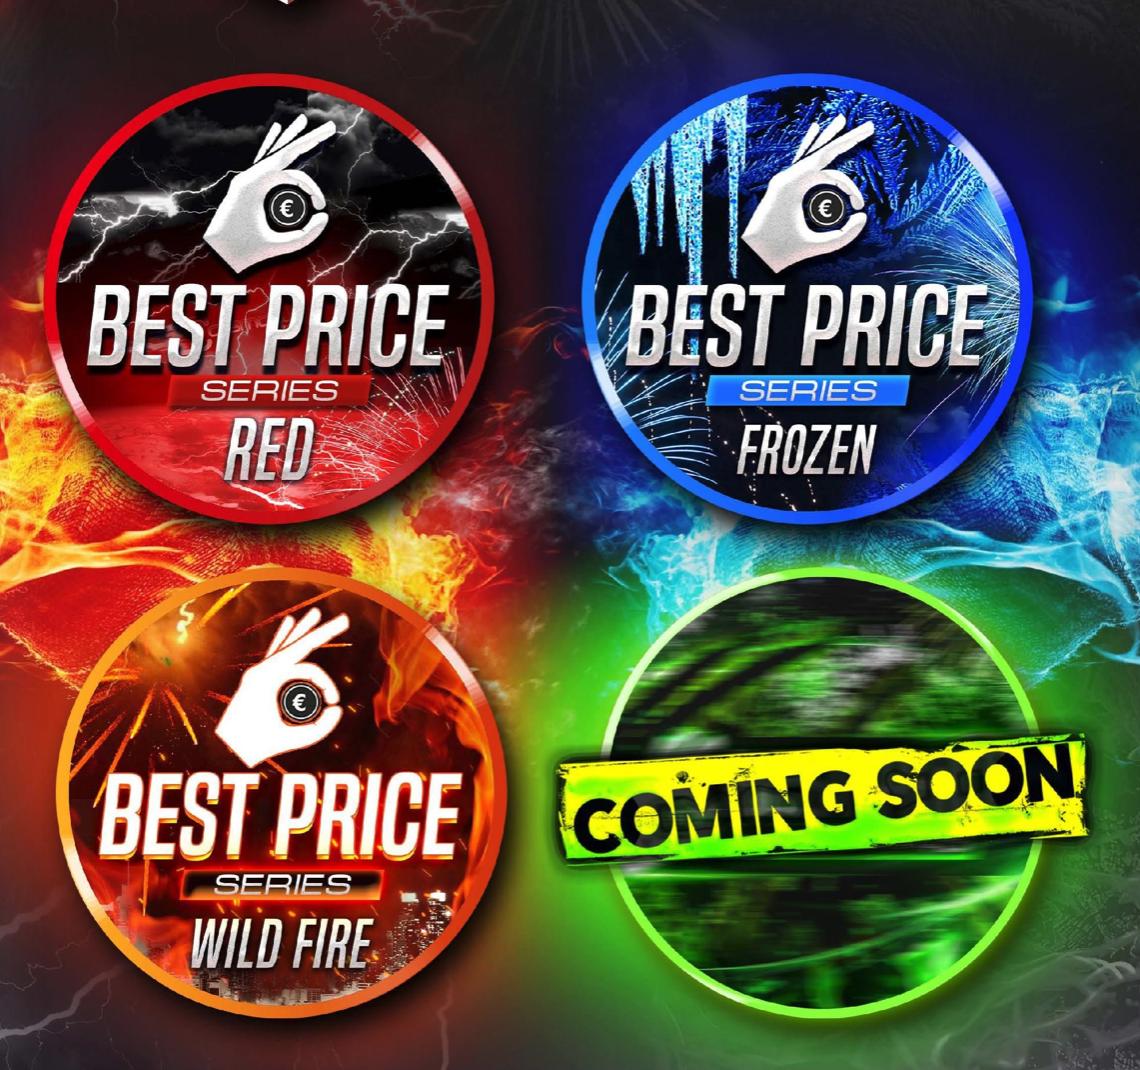 Best price series